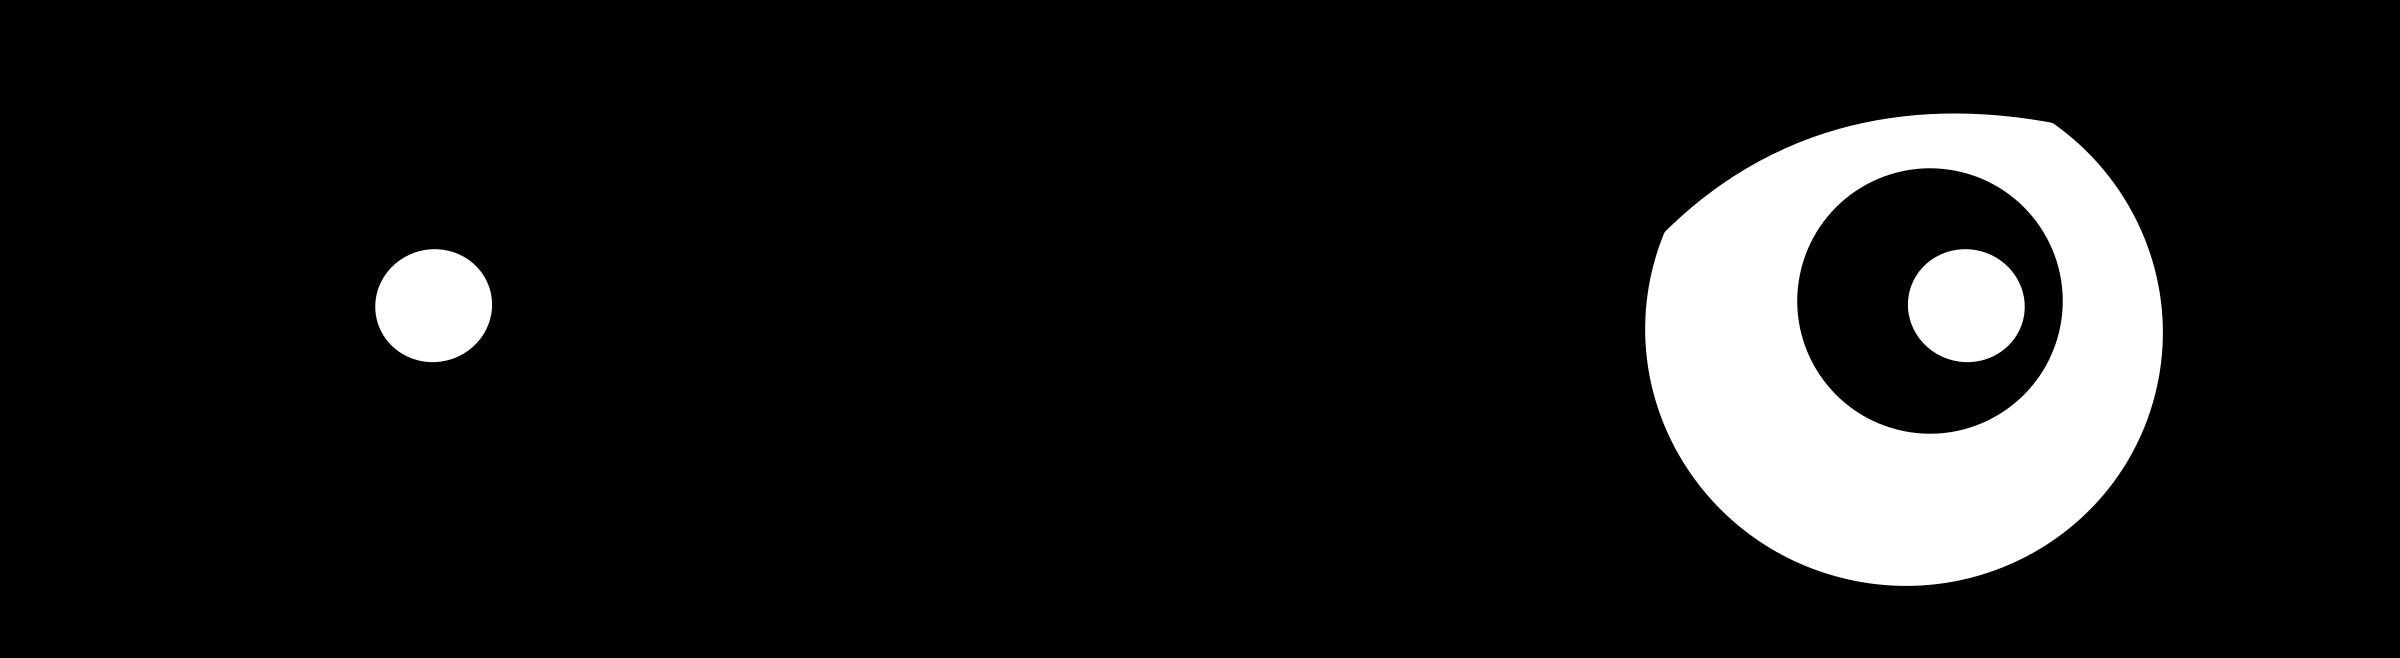 2400x658 Clipart